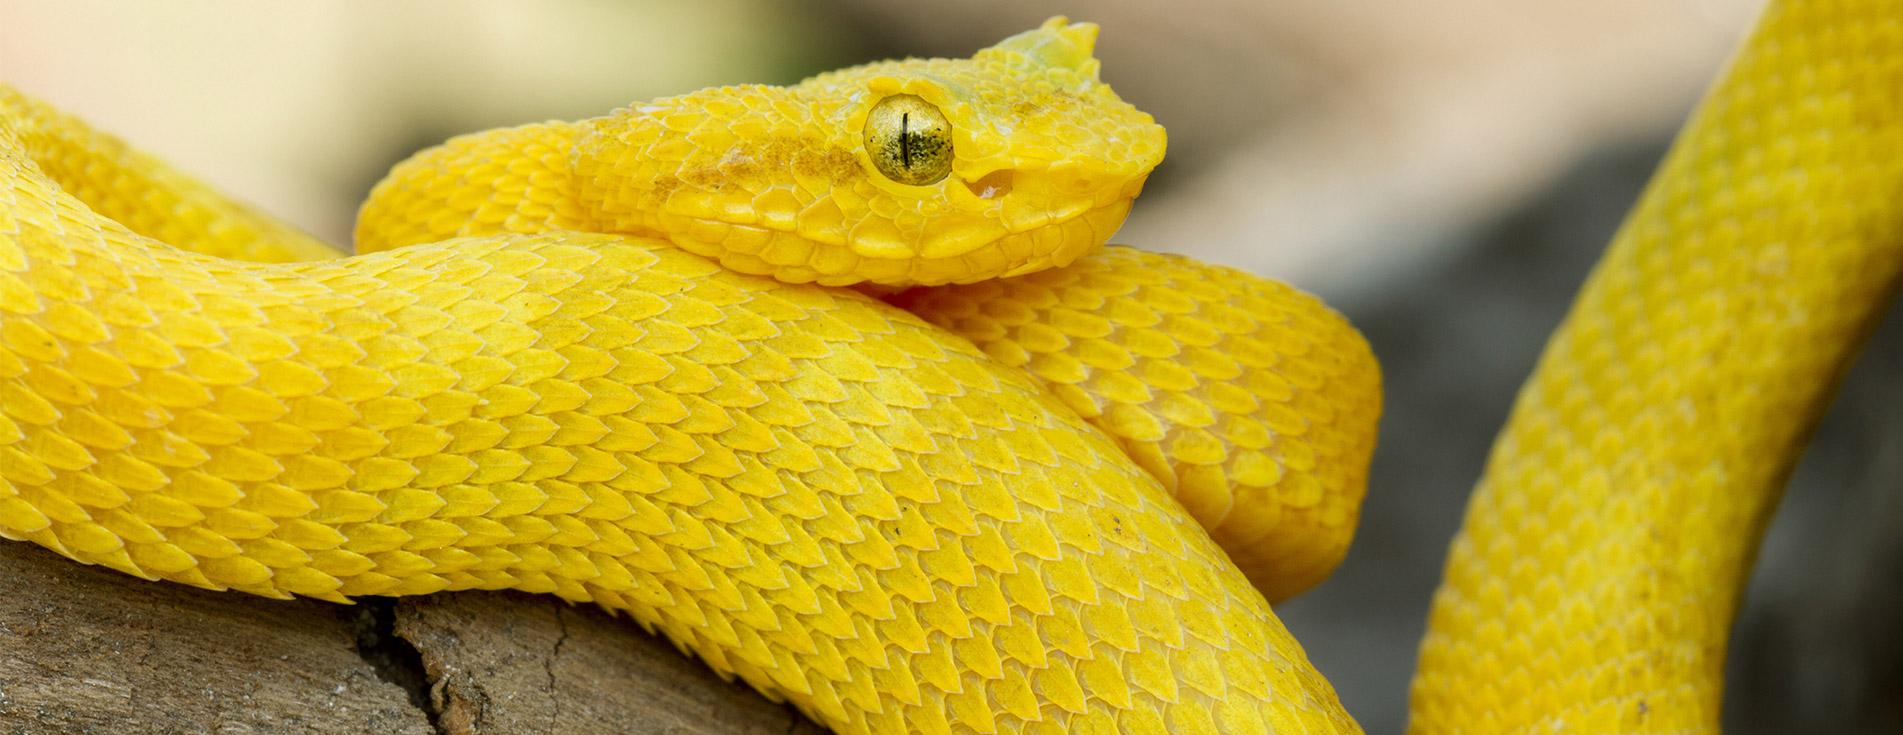 Snakes 3D